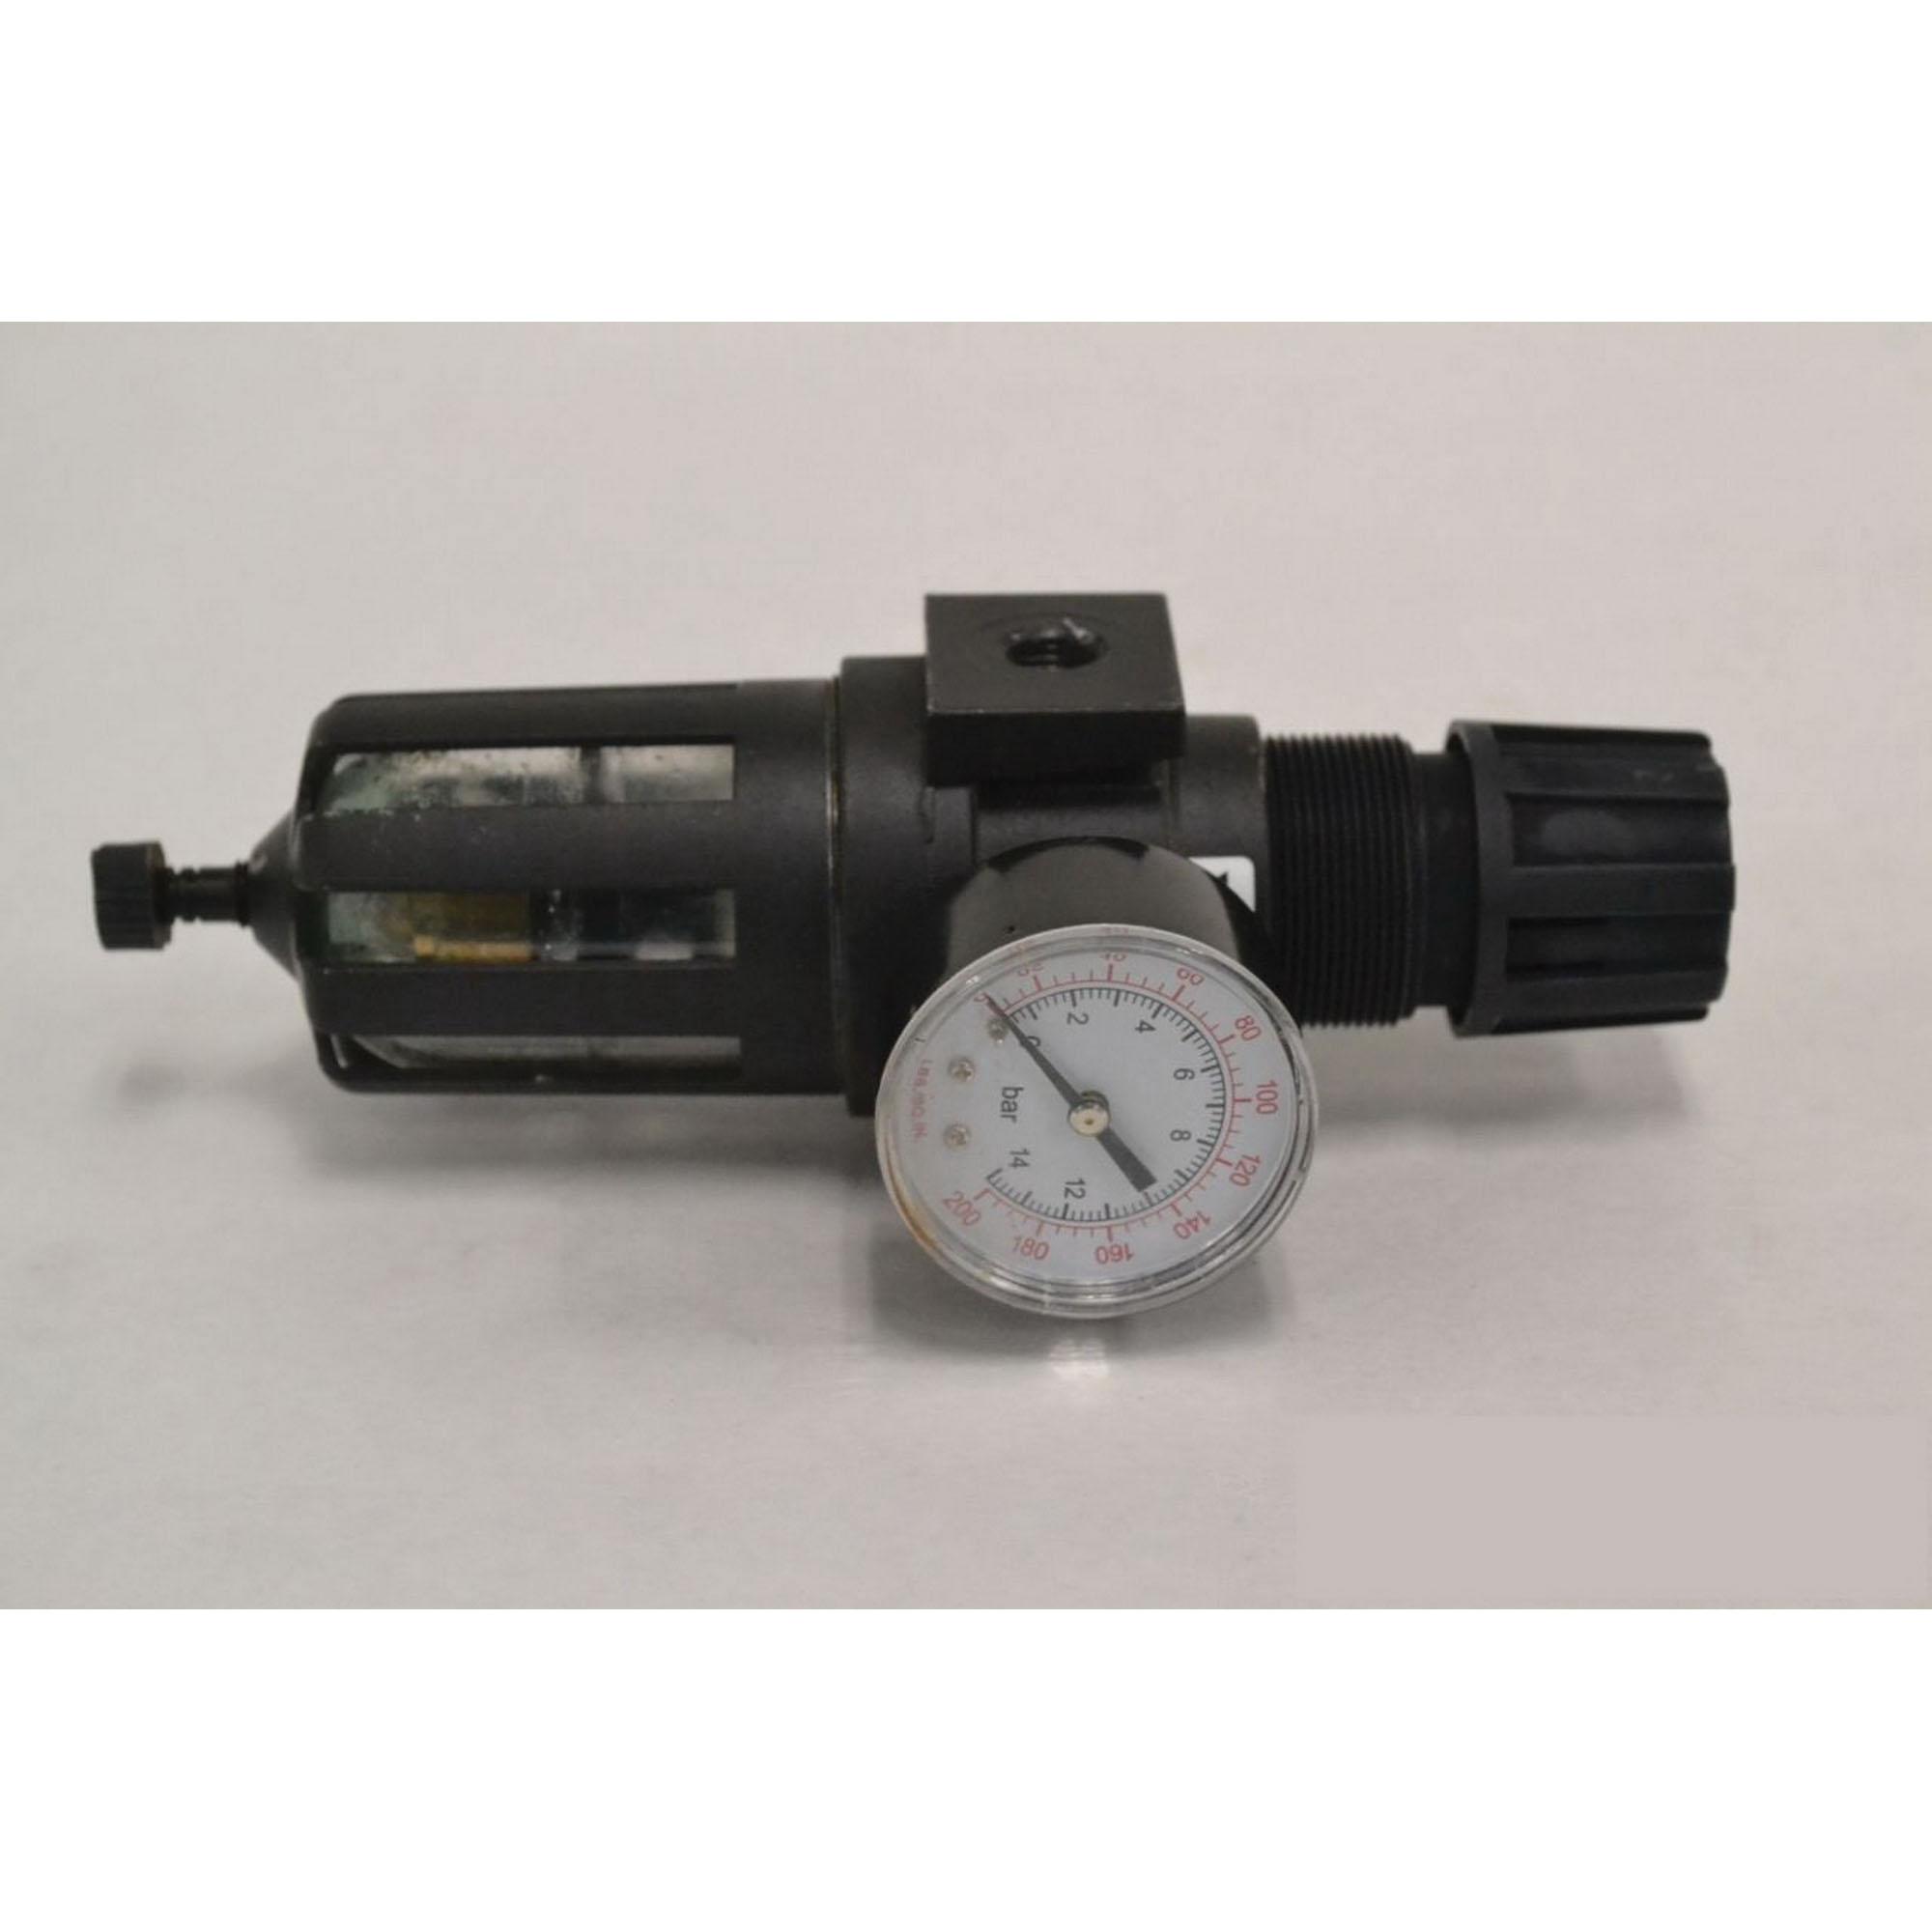 Master Pneumatic Guardsman CFR60-4 Zinc Integral Filter/Regulator, 5 micron, 150 psig, 40 - 125 deg F